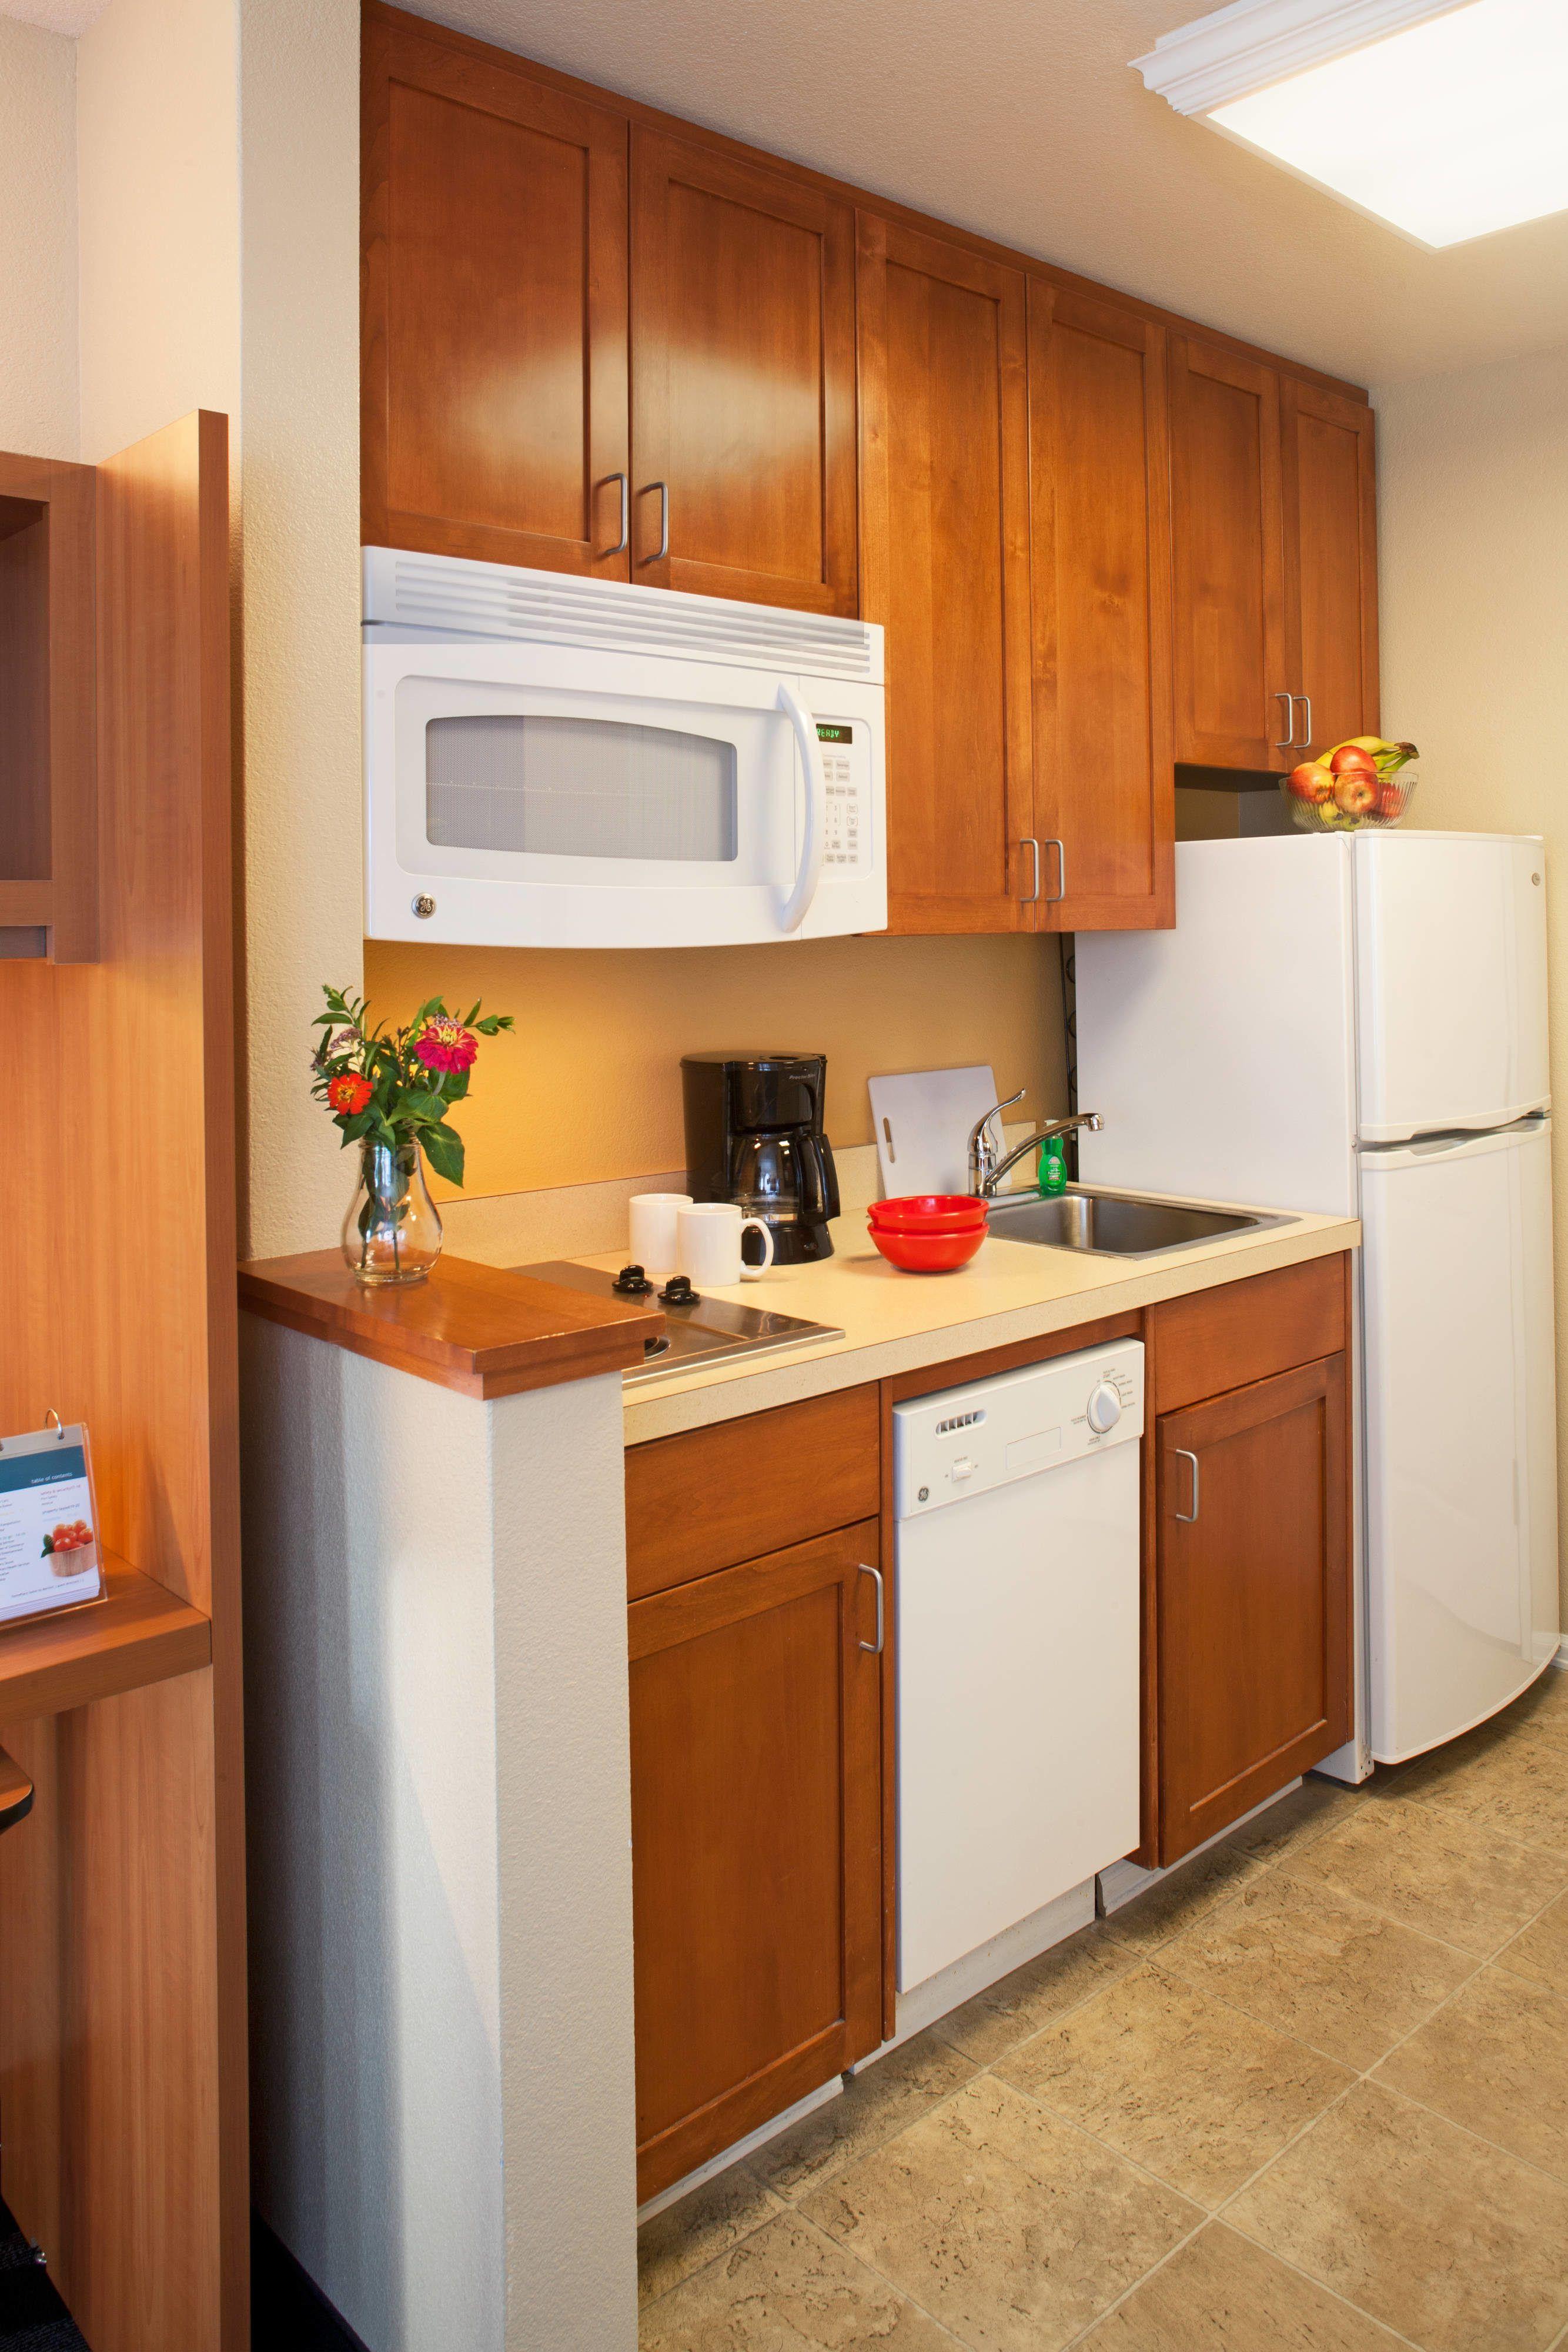 Towneplace Suites Medford Suite Kitchen Beautiful Suite Enjoy Suites Kitchen Kitchen Cabinets